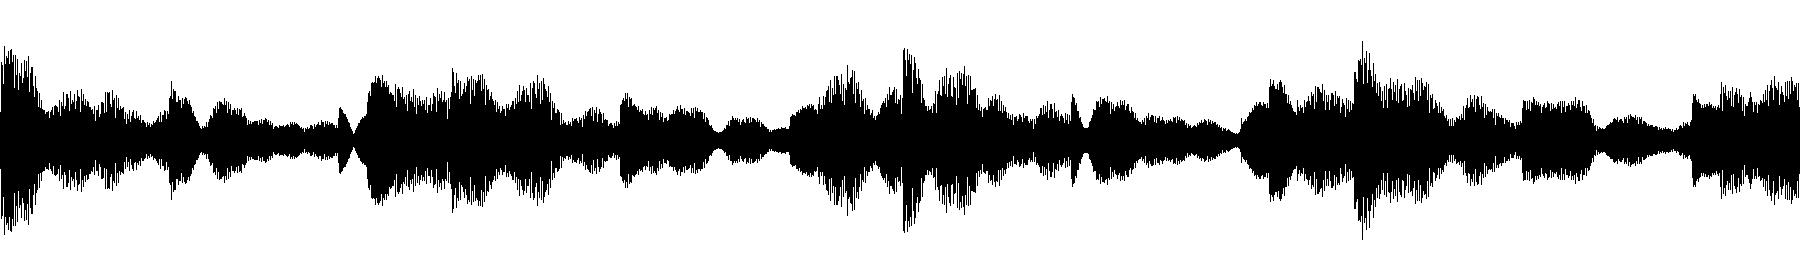 uber chill lofi rhodes piano chords   130bpm   dmin   thedrumbank